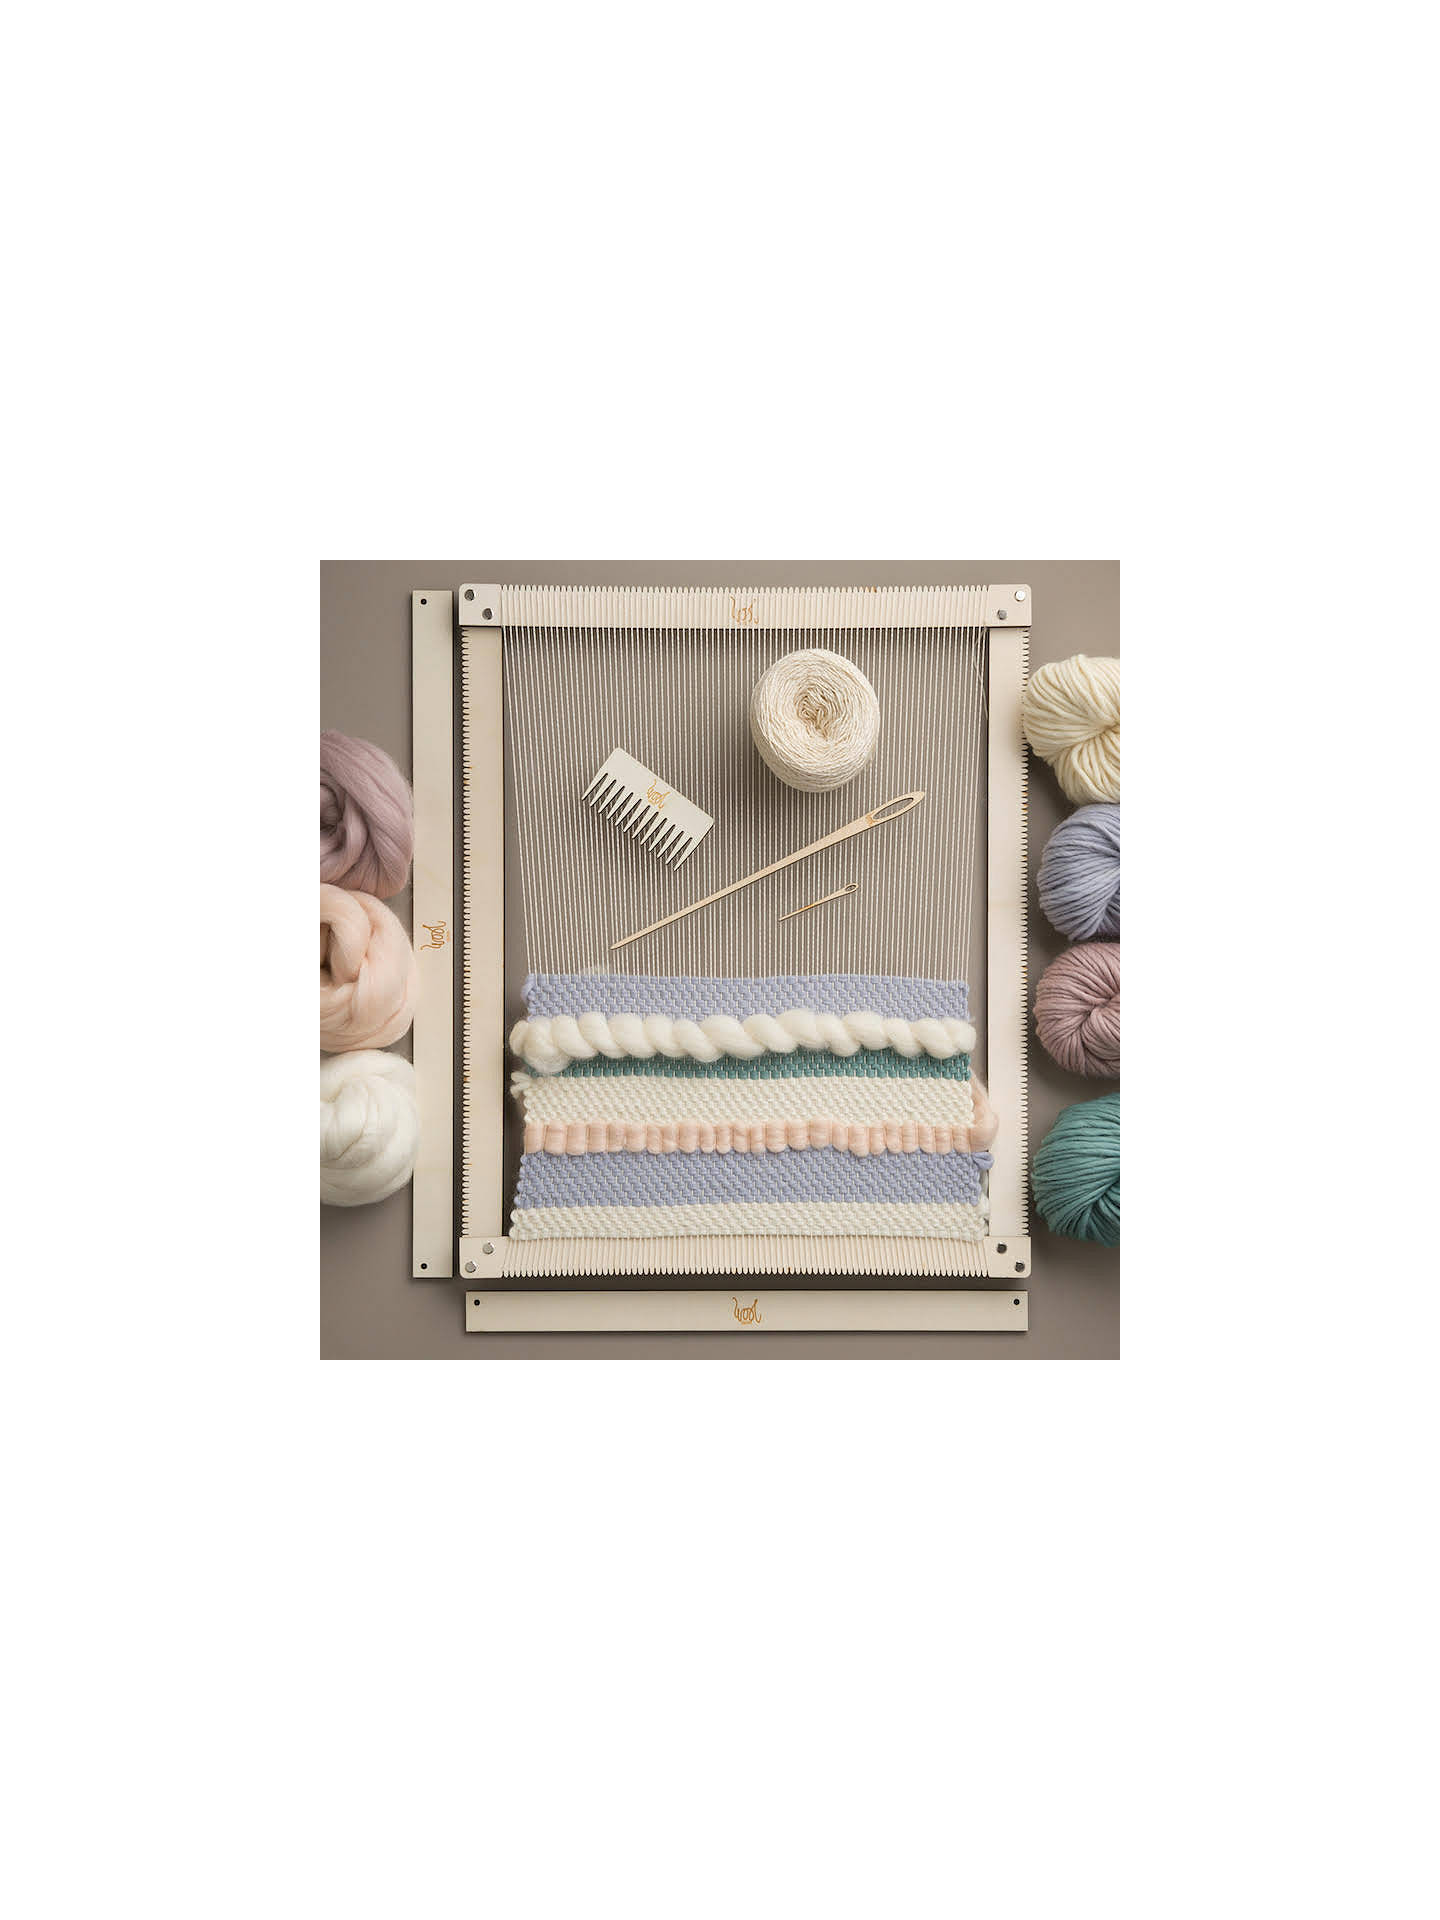 Wool Couture Rectangular Weaving Loom